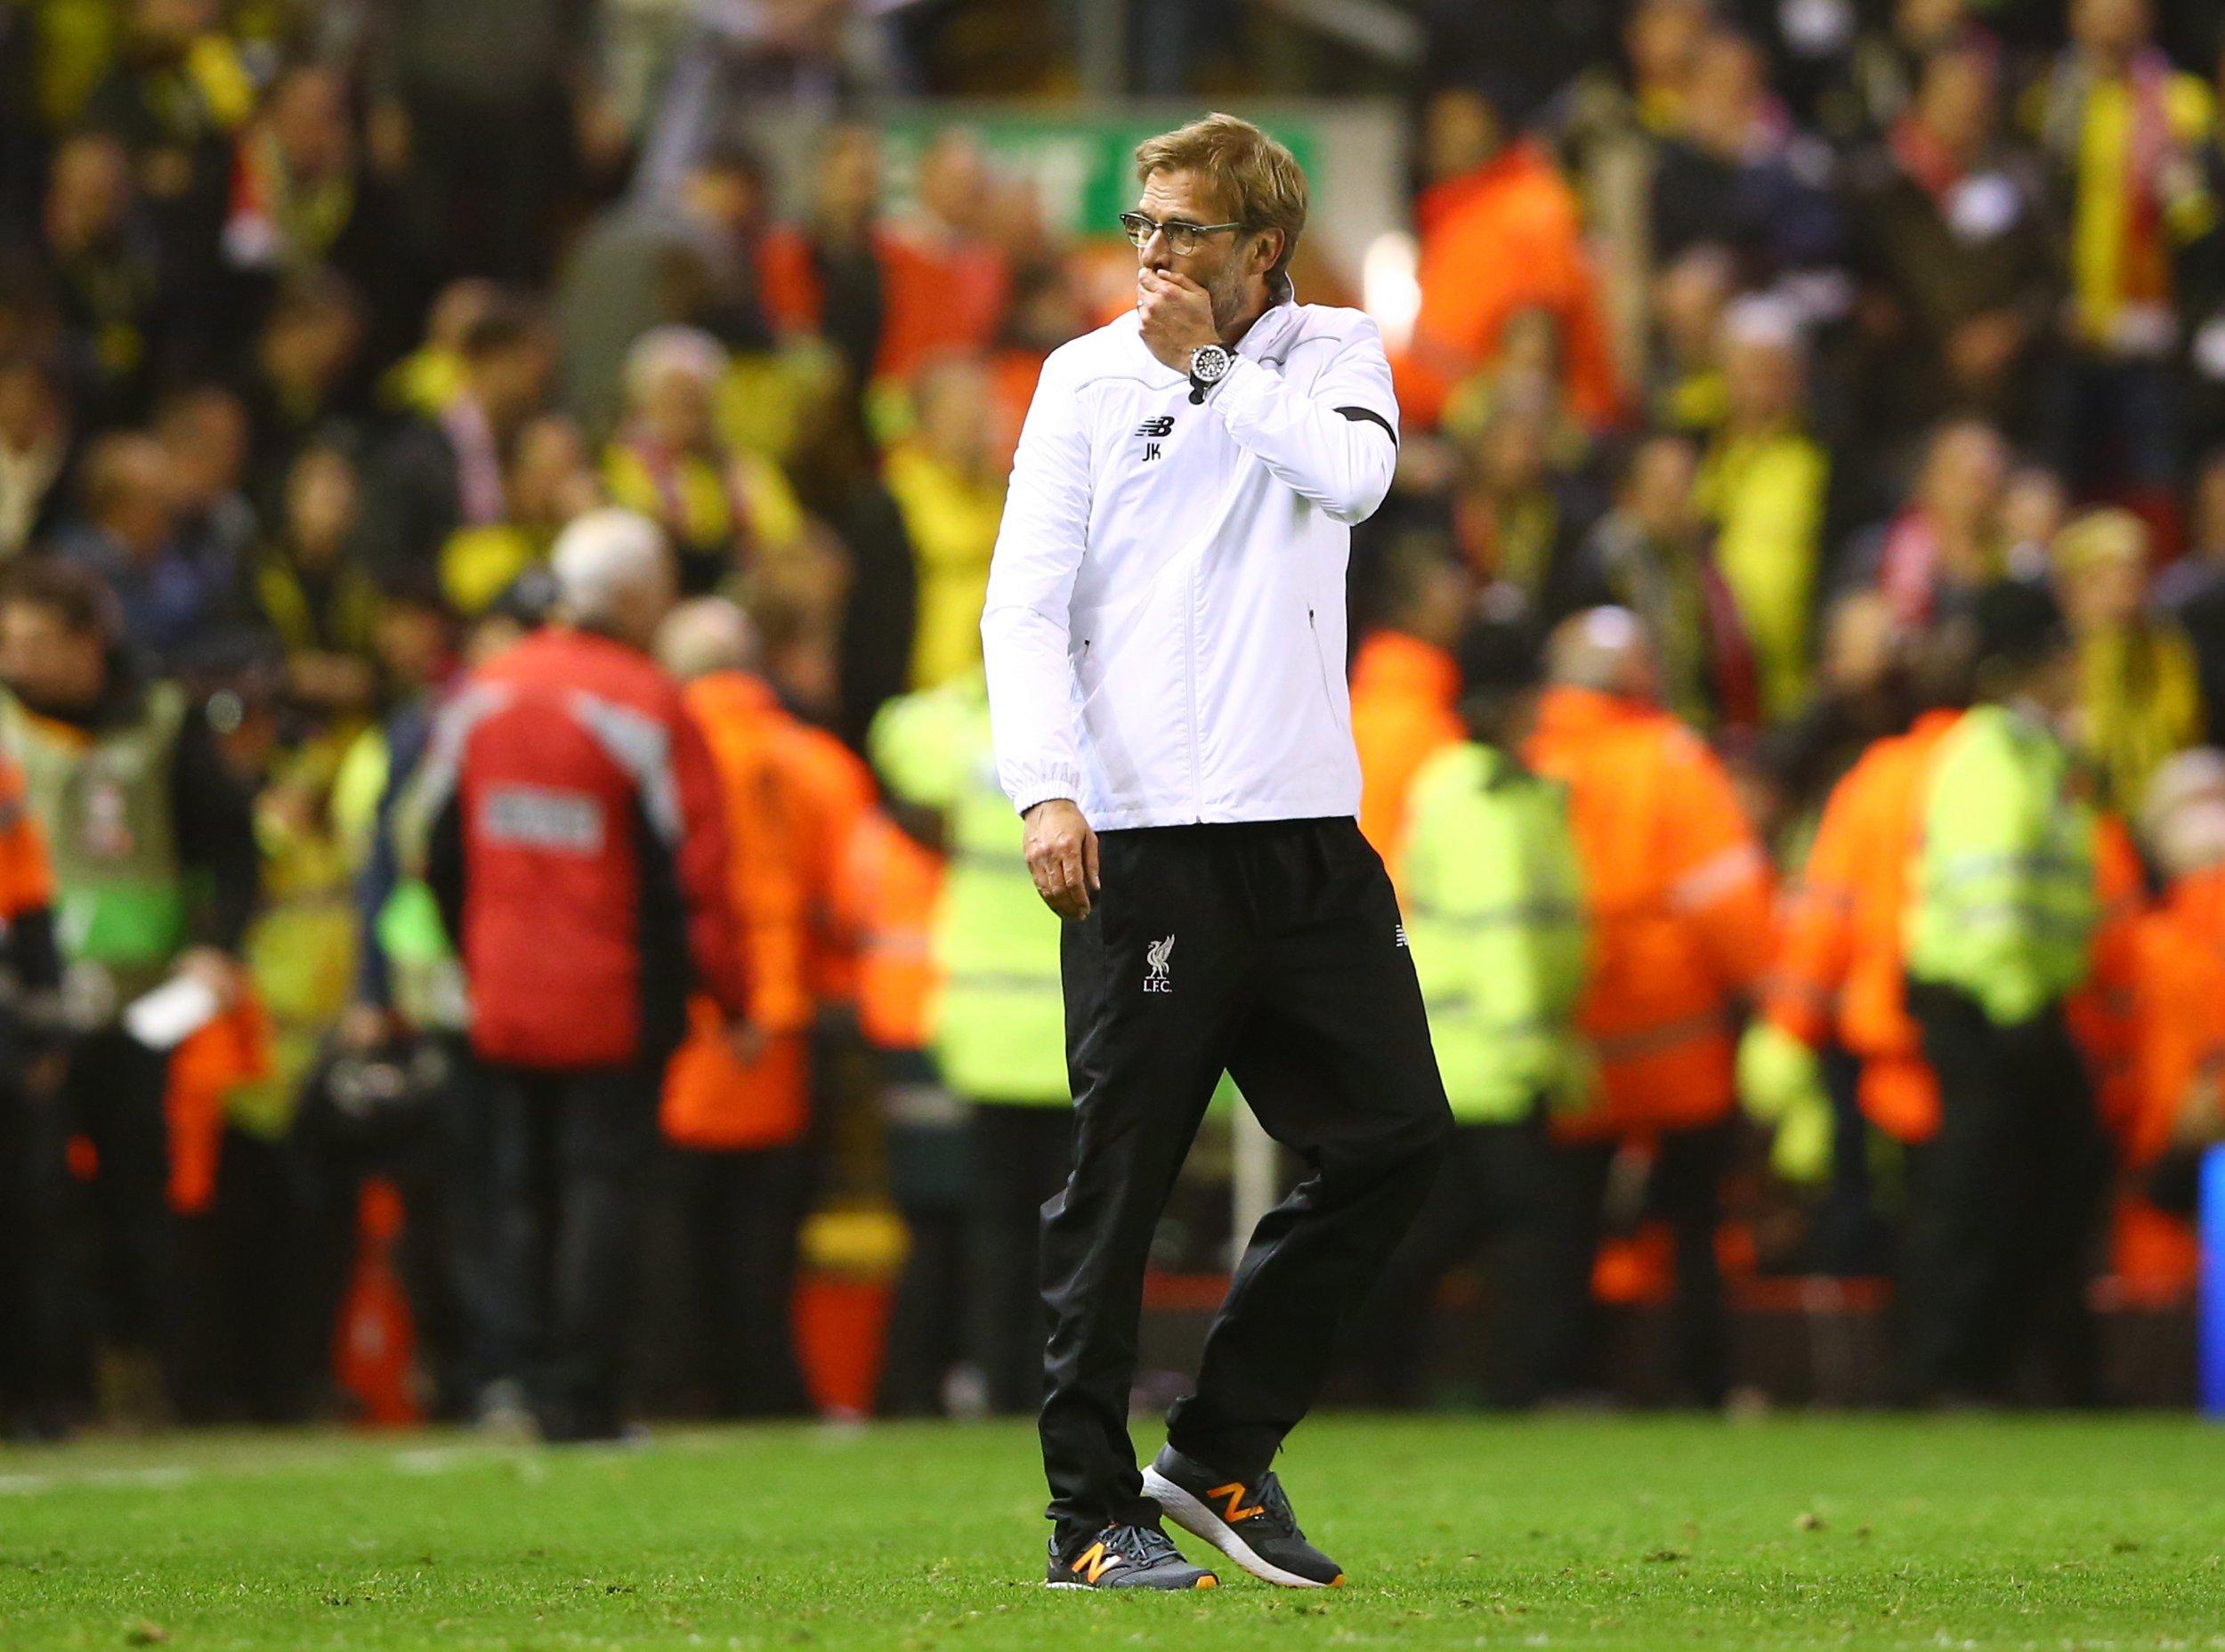 Jurgen Klopp's Liverpool snuck by his old team Borussia Dortmund inn the Europa League quarter-final.